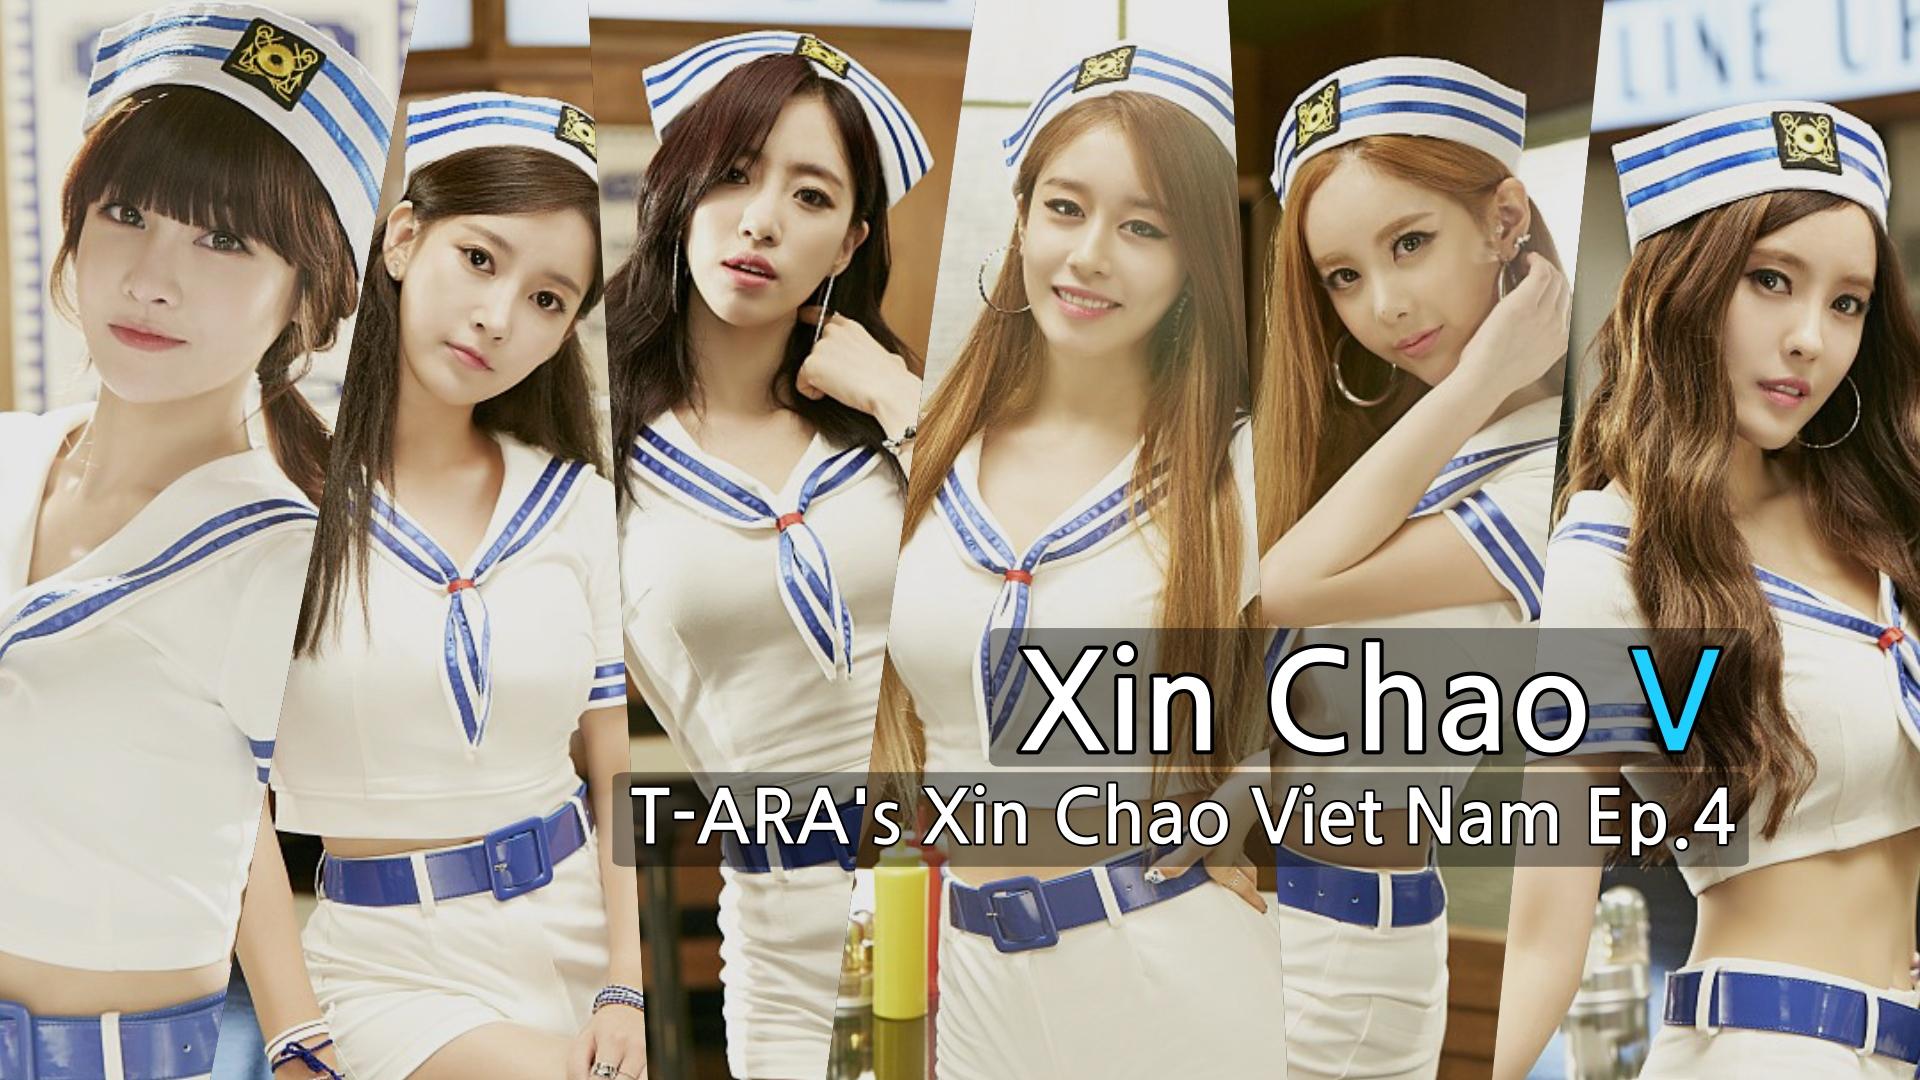 T-ARA's Xin Chao Viet Nam Ep.4